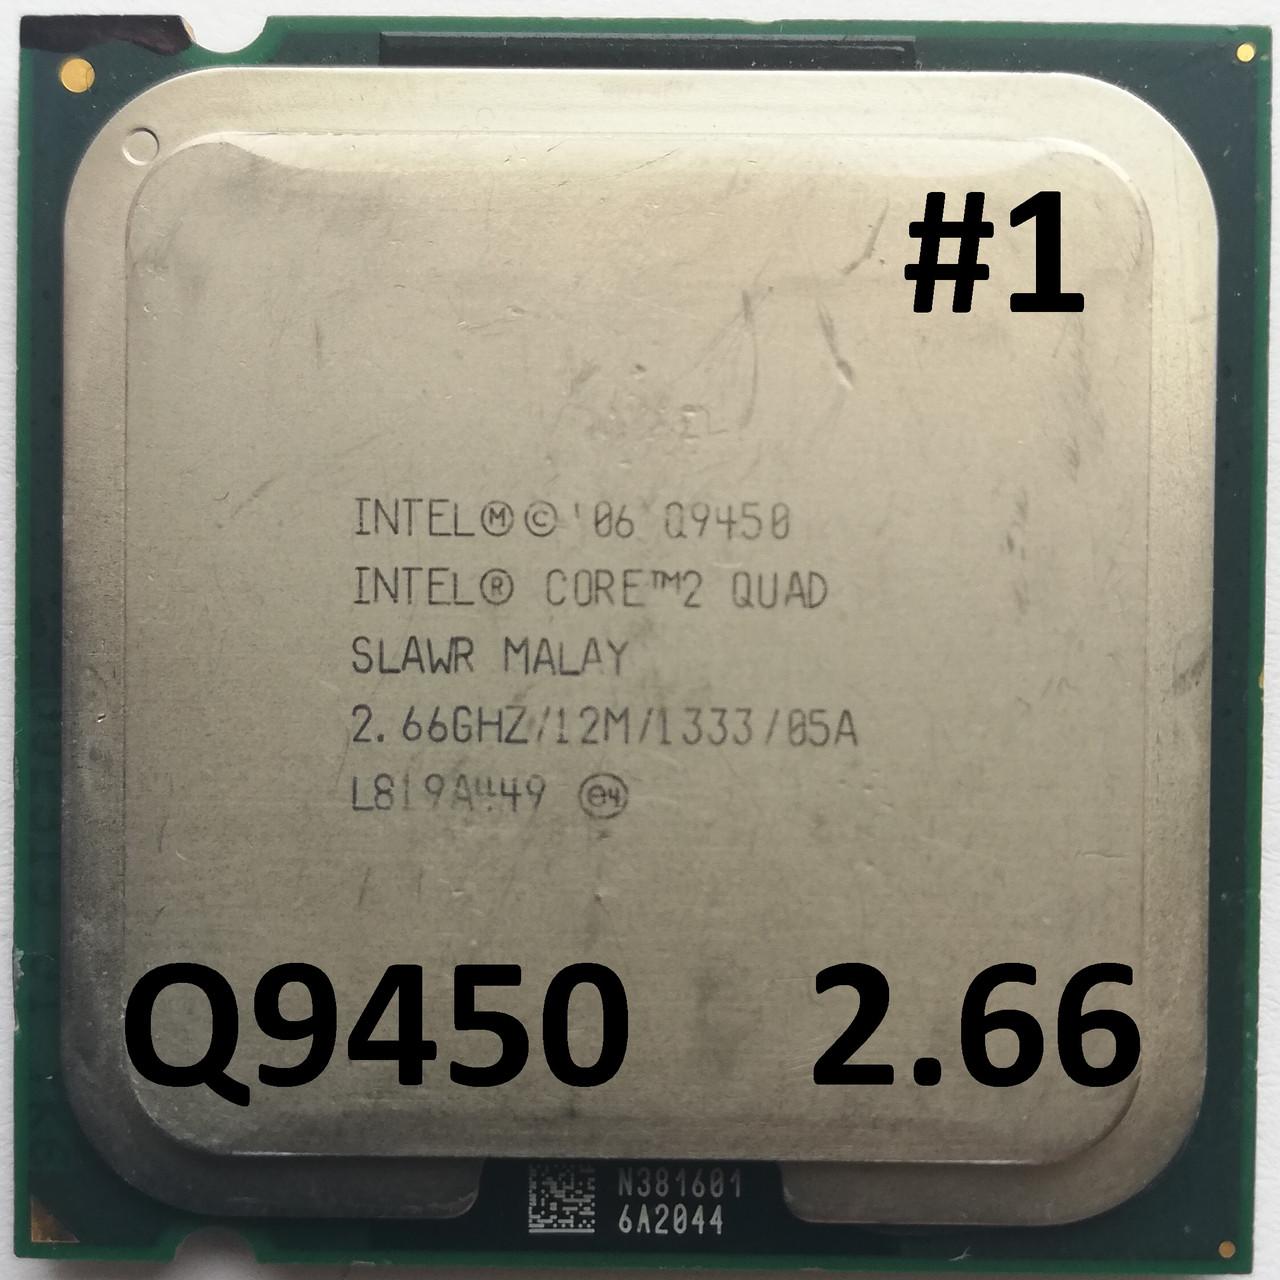 Процессор ЛОТ #1 Intel® Core™2 Quad Q9450 SLAWR 2.66GHz 12M Cache 1333 MHz FSB Soket 775 Б/У